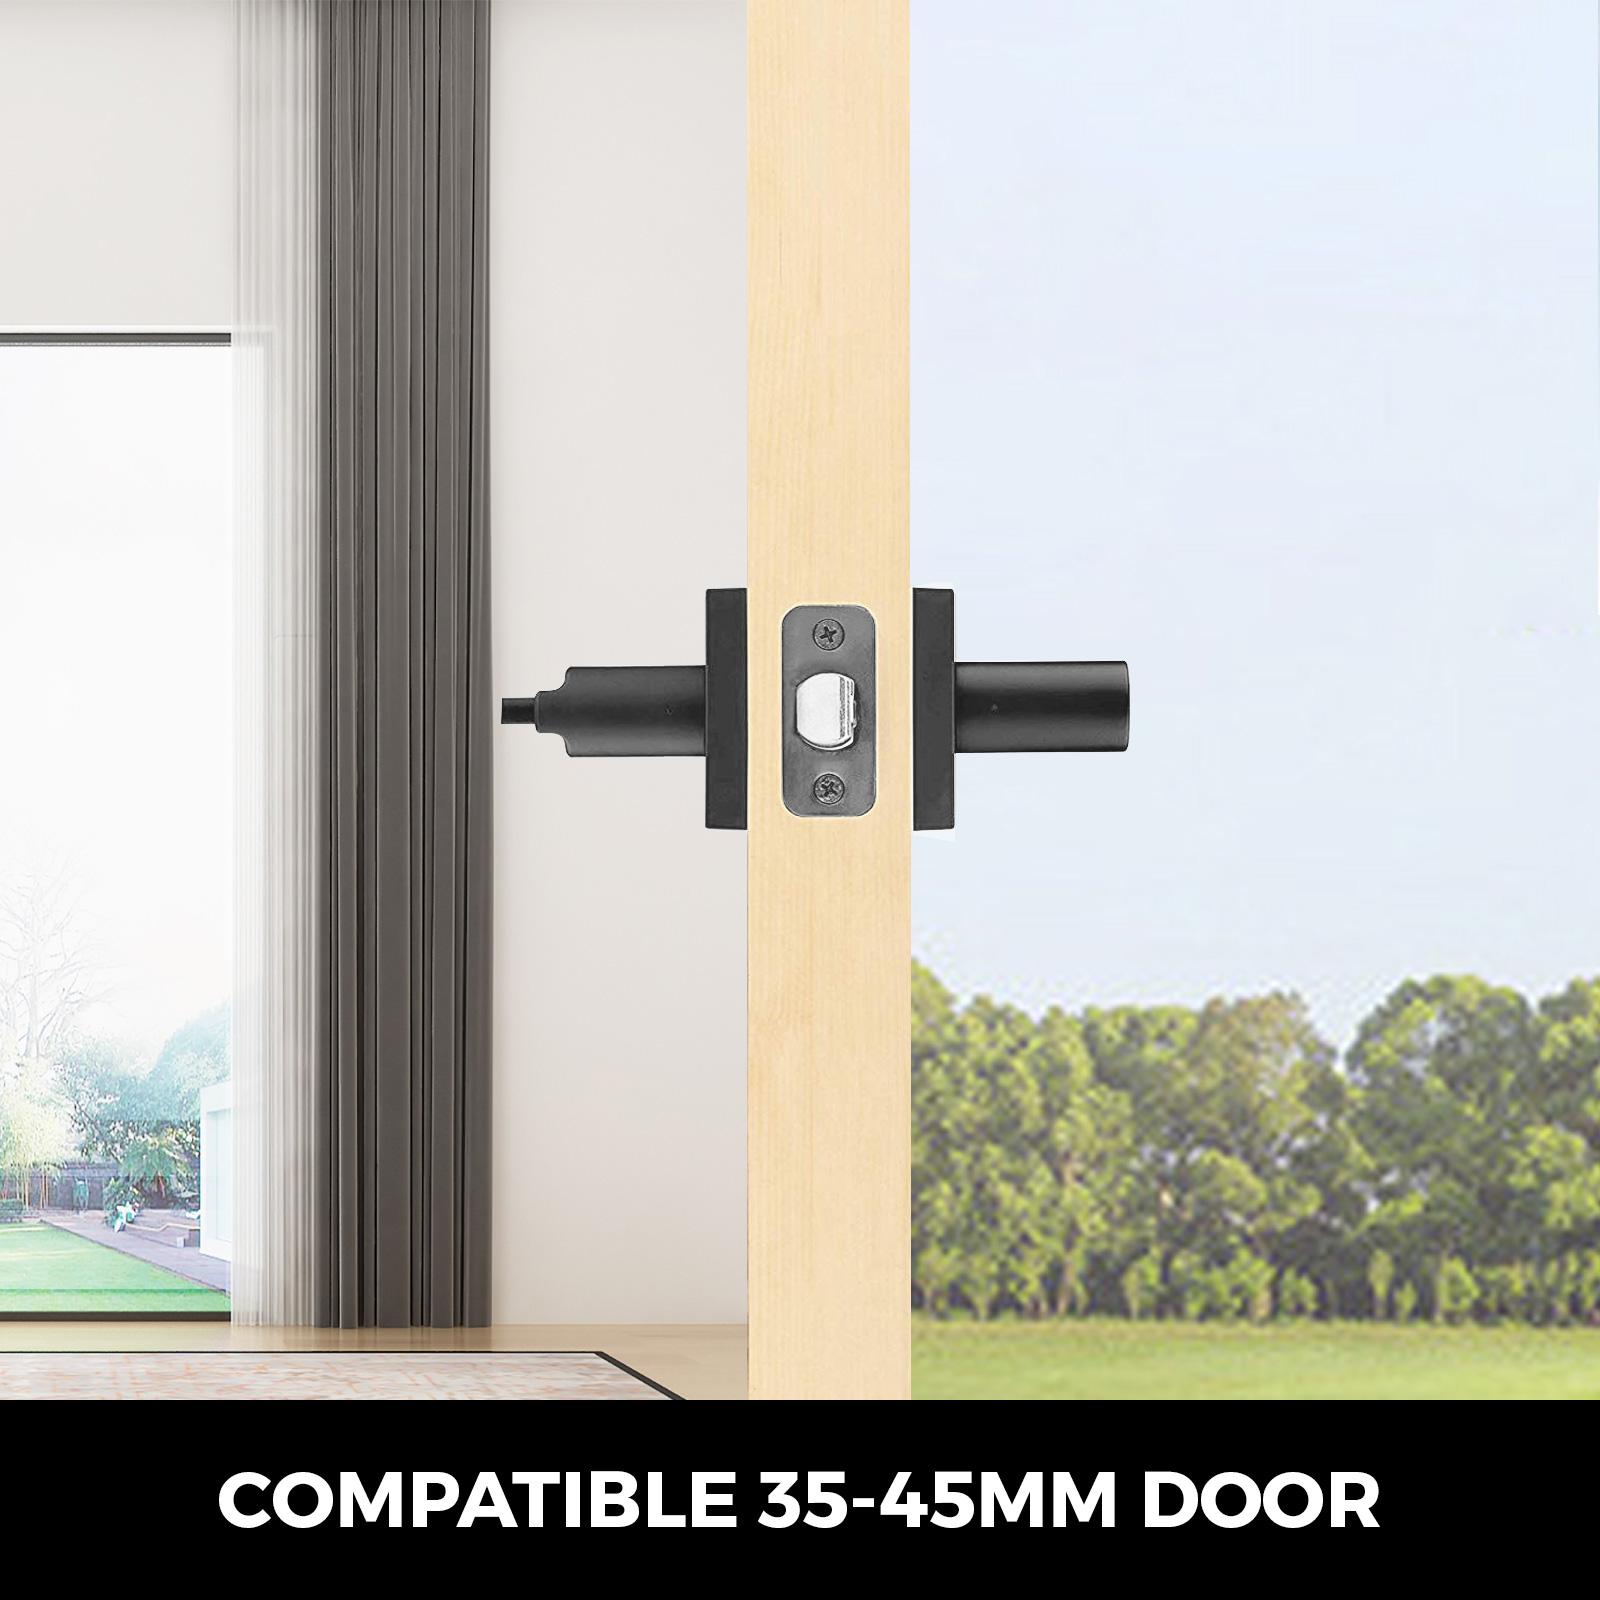 Door-Handles-Matte-Black-Door-Lever-3-5-10-Pack-Passage-Privace-Entry-Lock-Set thumbnail 89